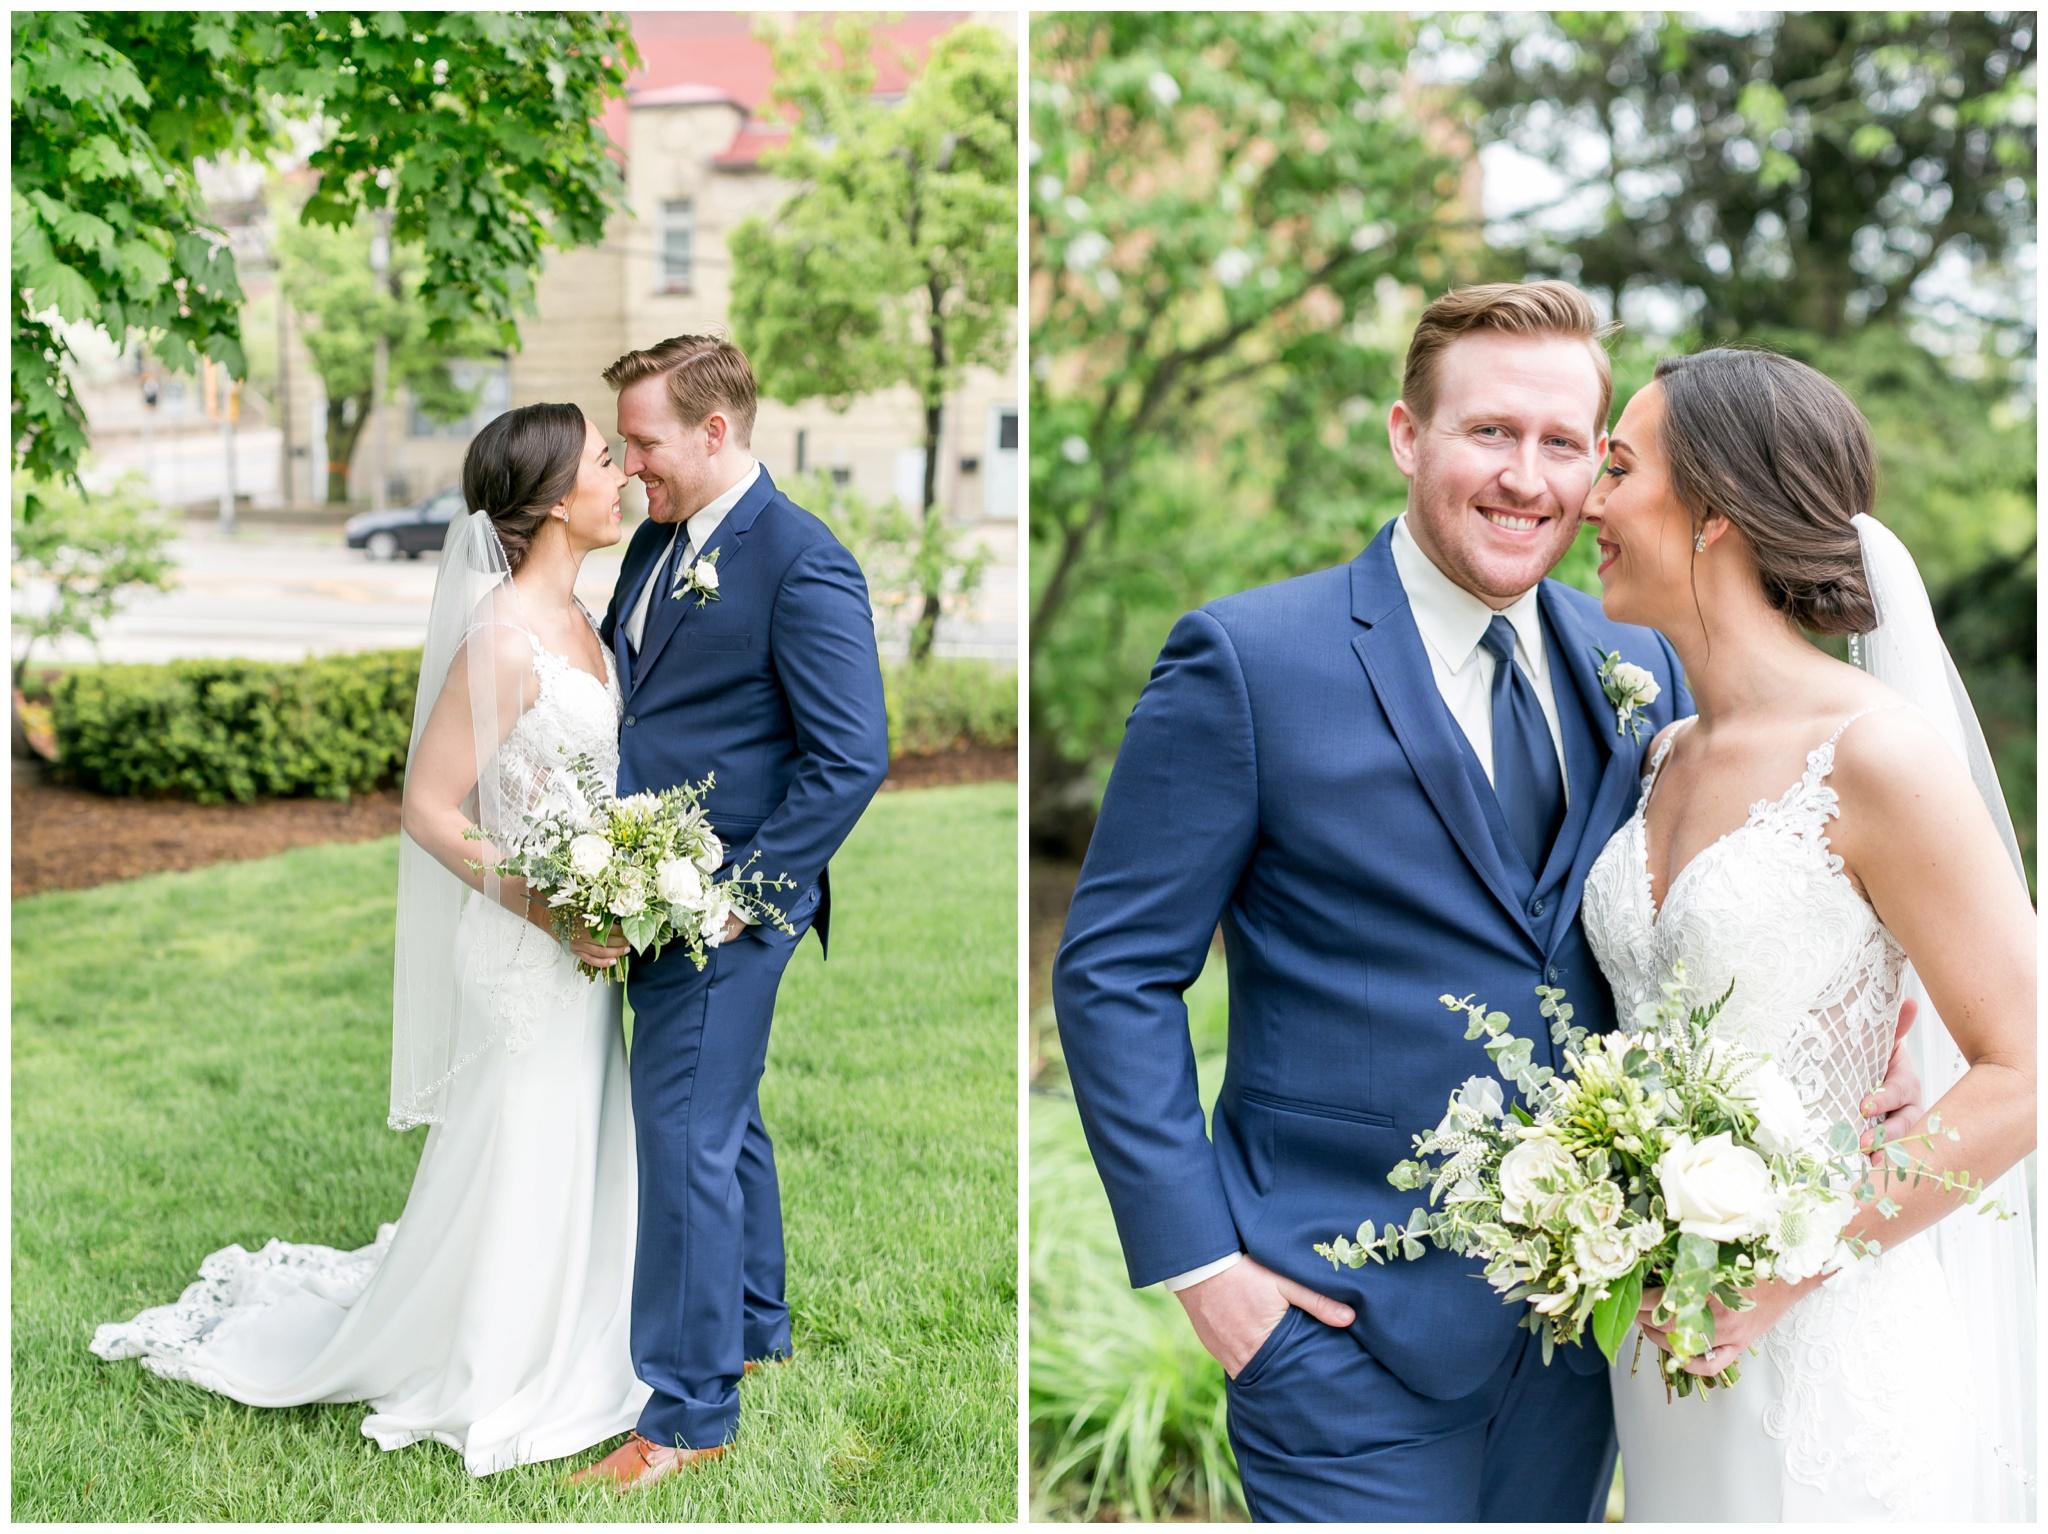 Union_south_Wedding_Madison_Wisconsin_Caynay_Photo_3636.jpg